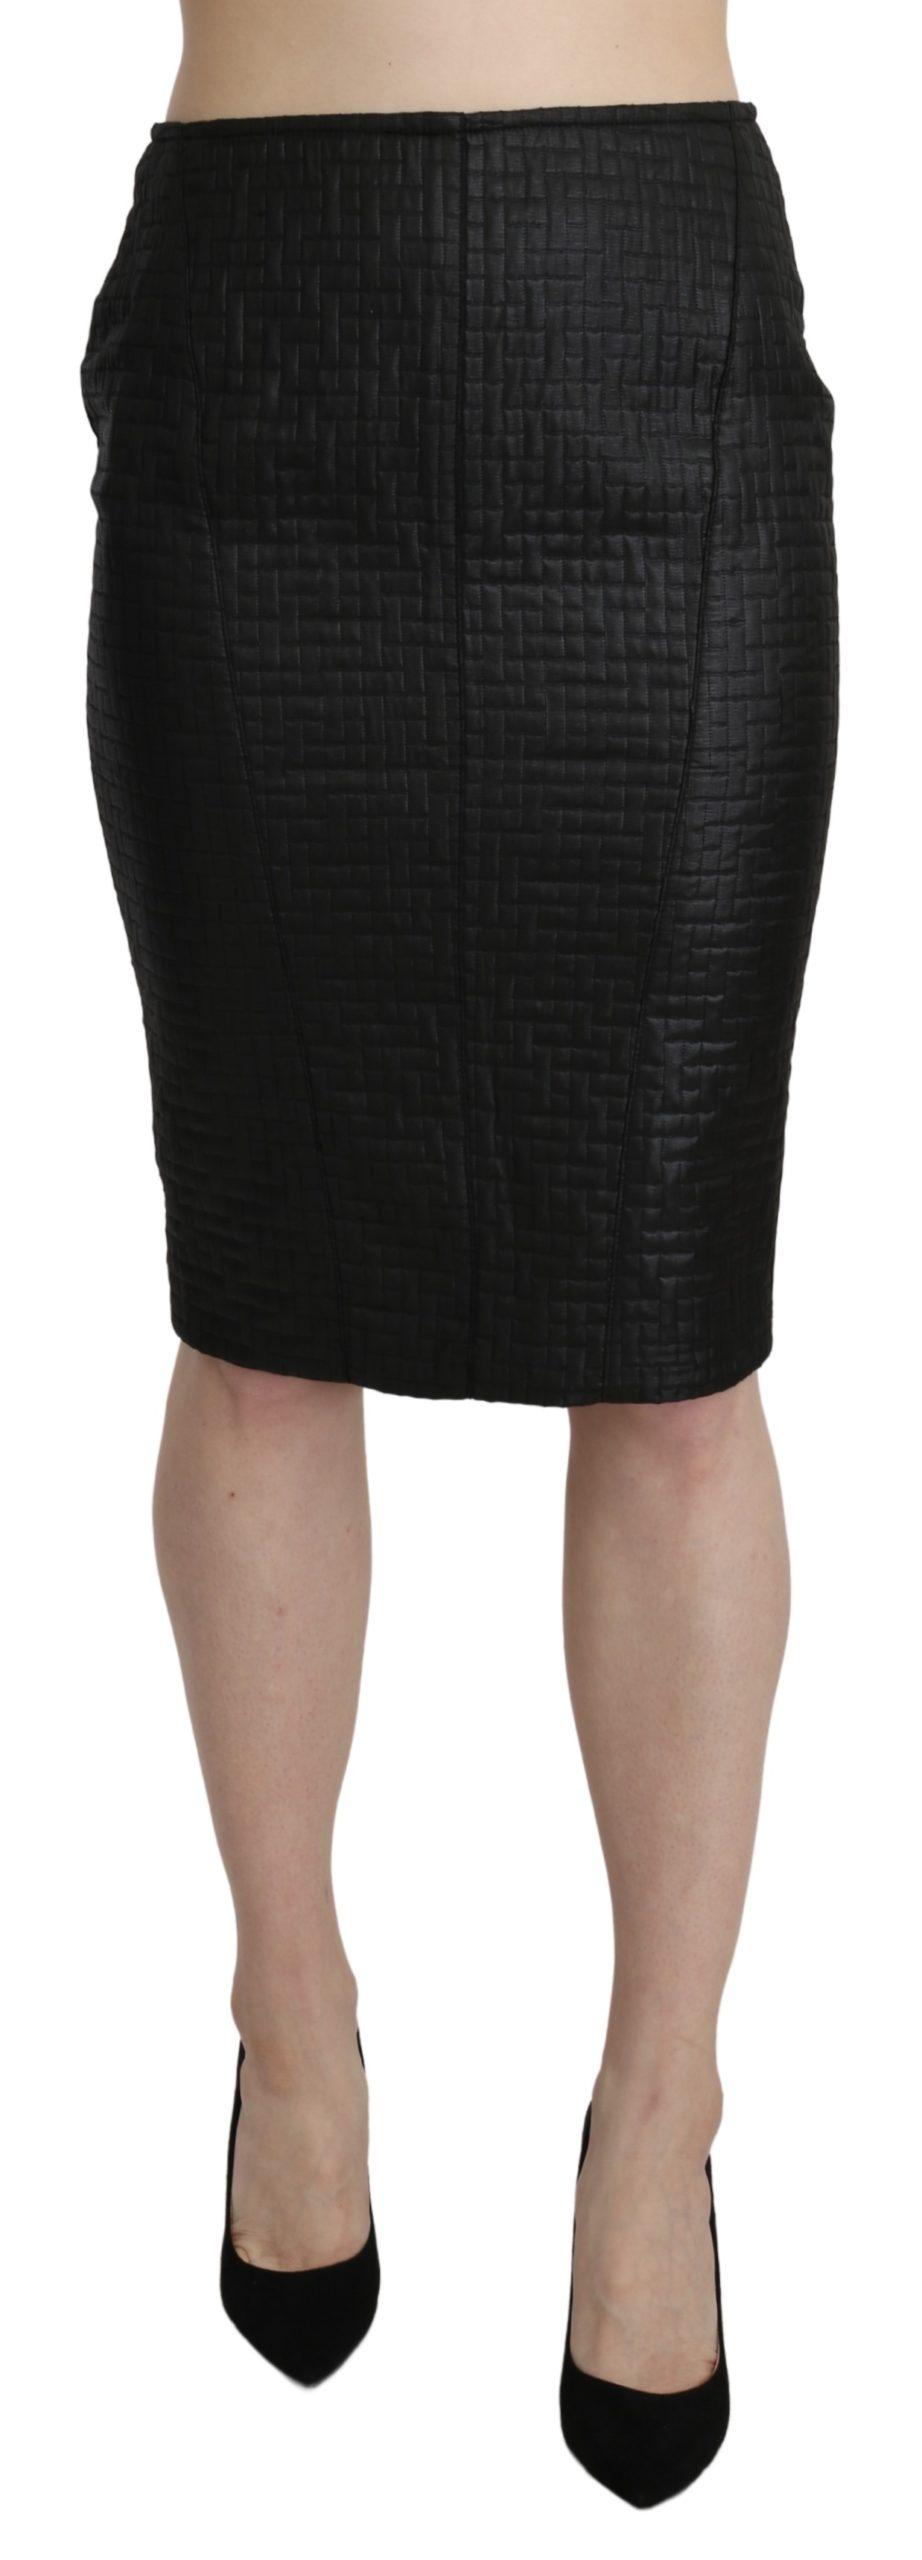 Black Pencil Knee Length Straight Patterned Skirt - IT42|M